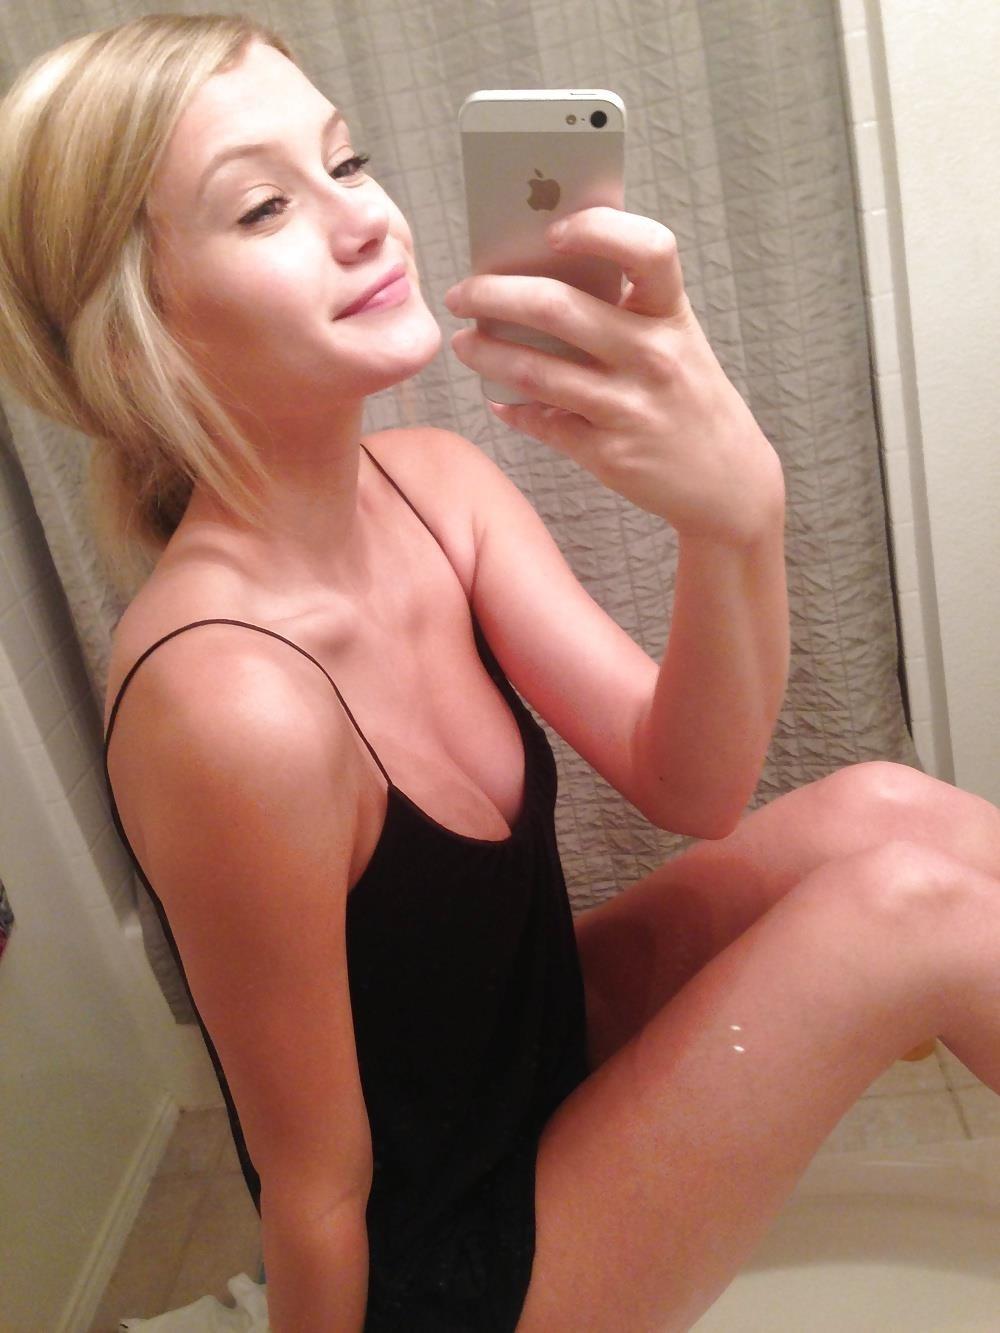 Busty teen nude selfie-4860